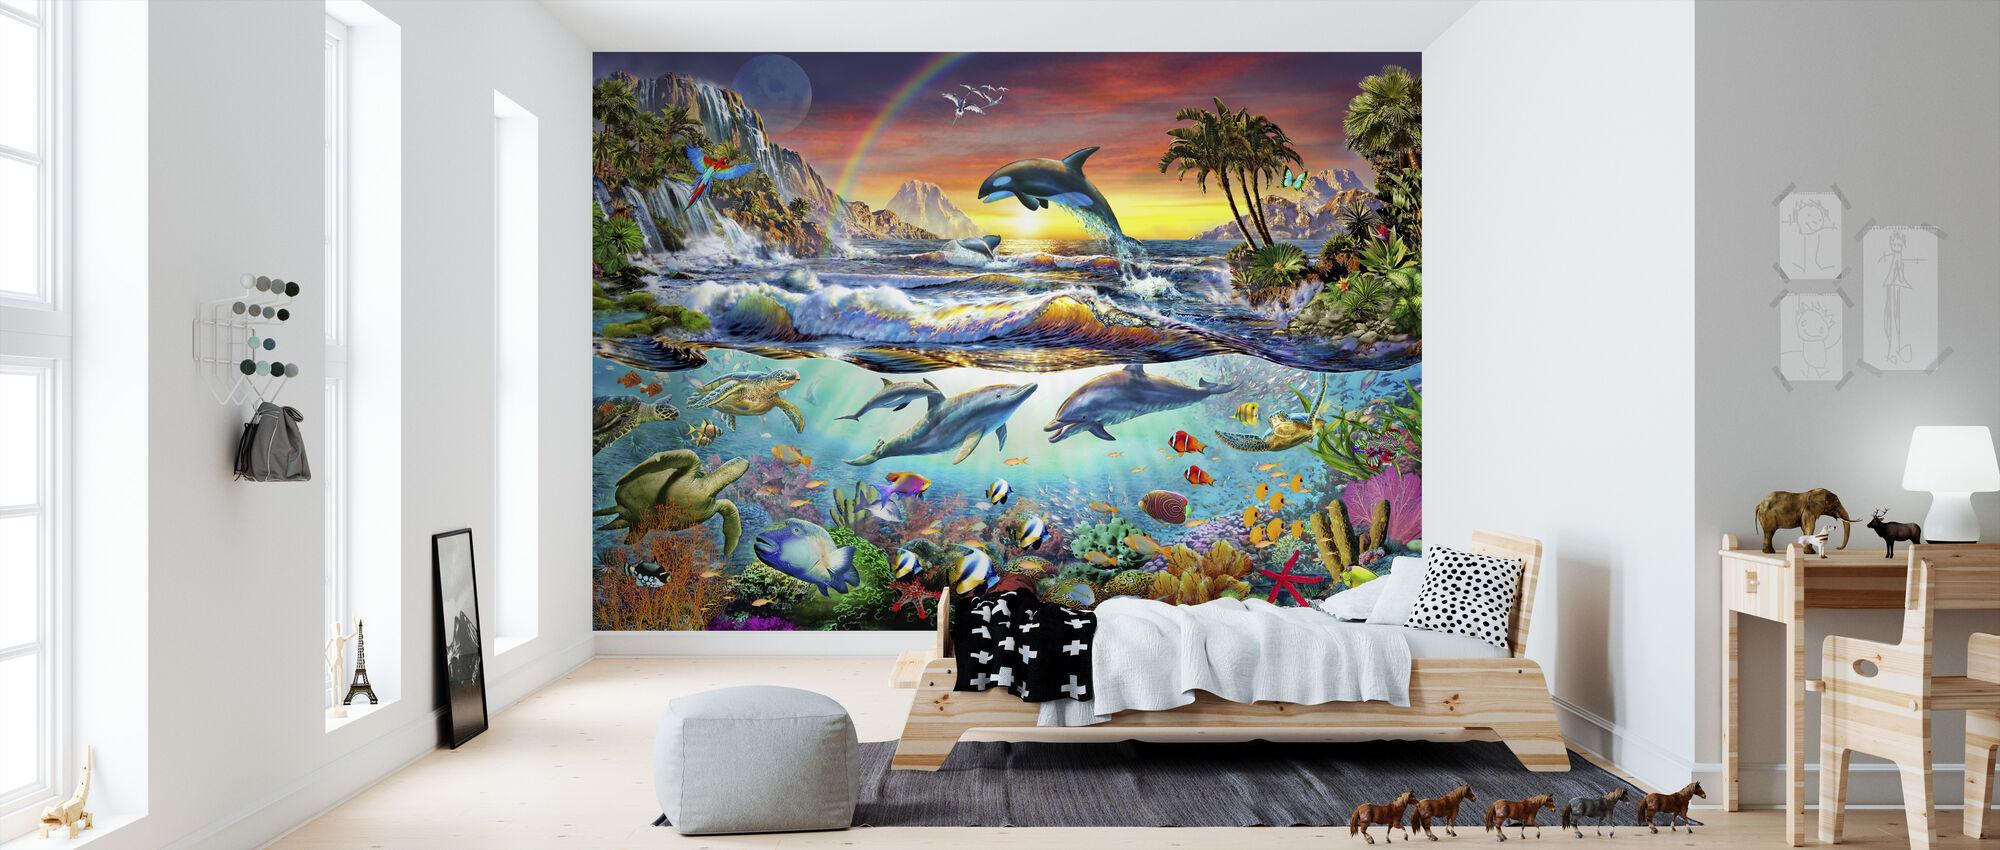 Paradise Cove - Wallpaper - Kids Room